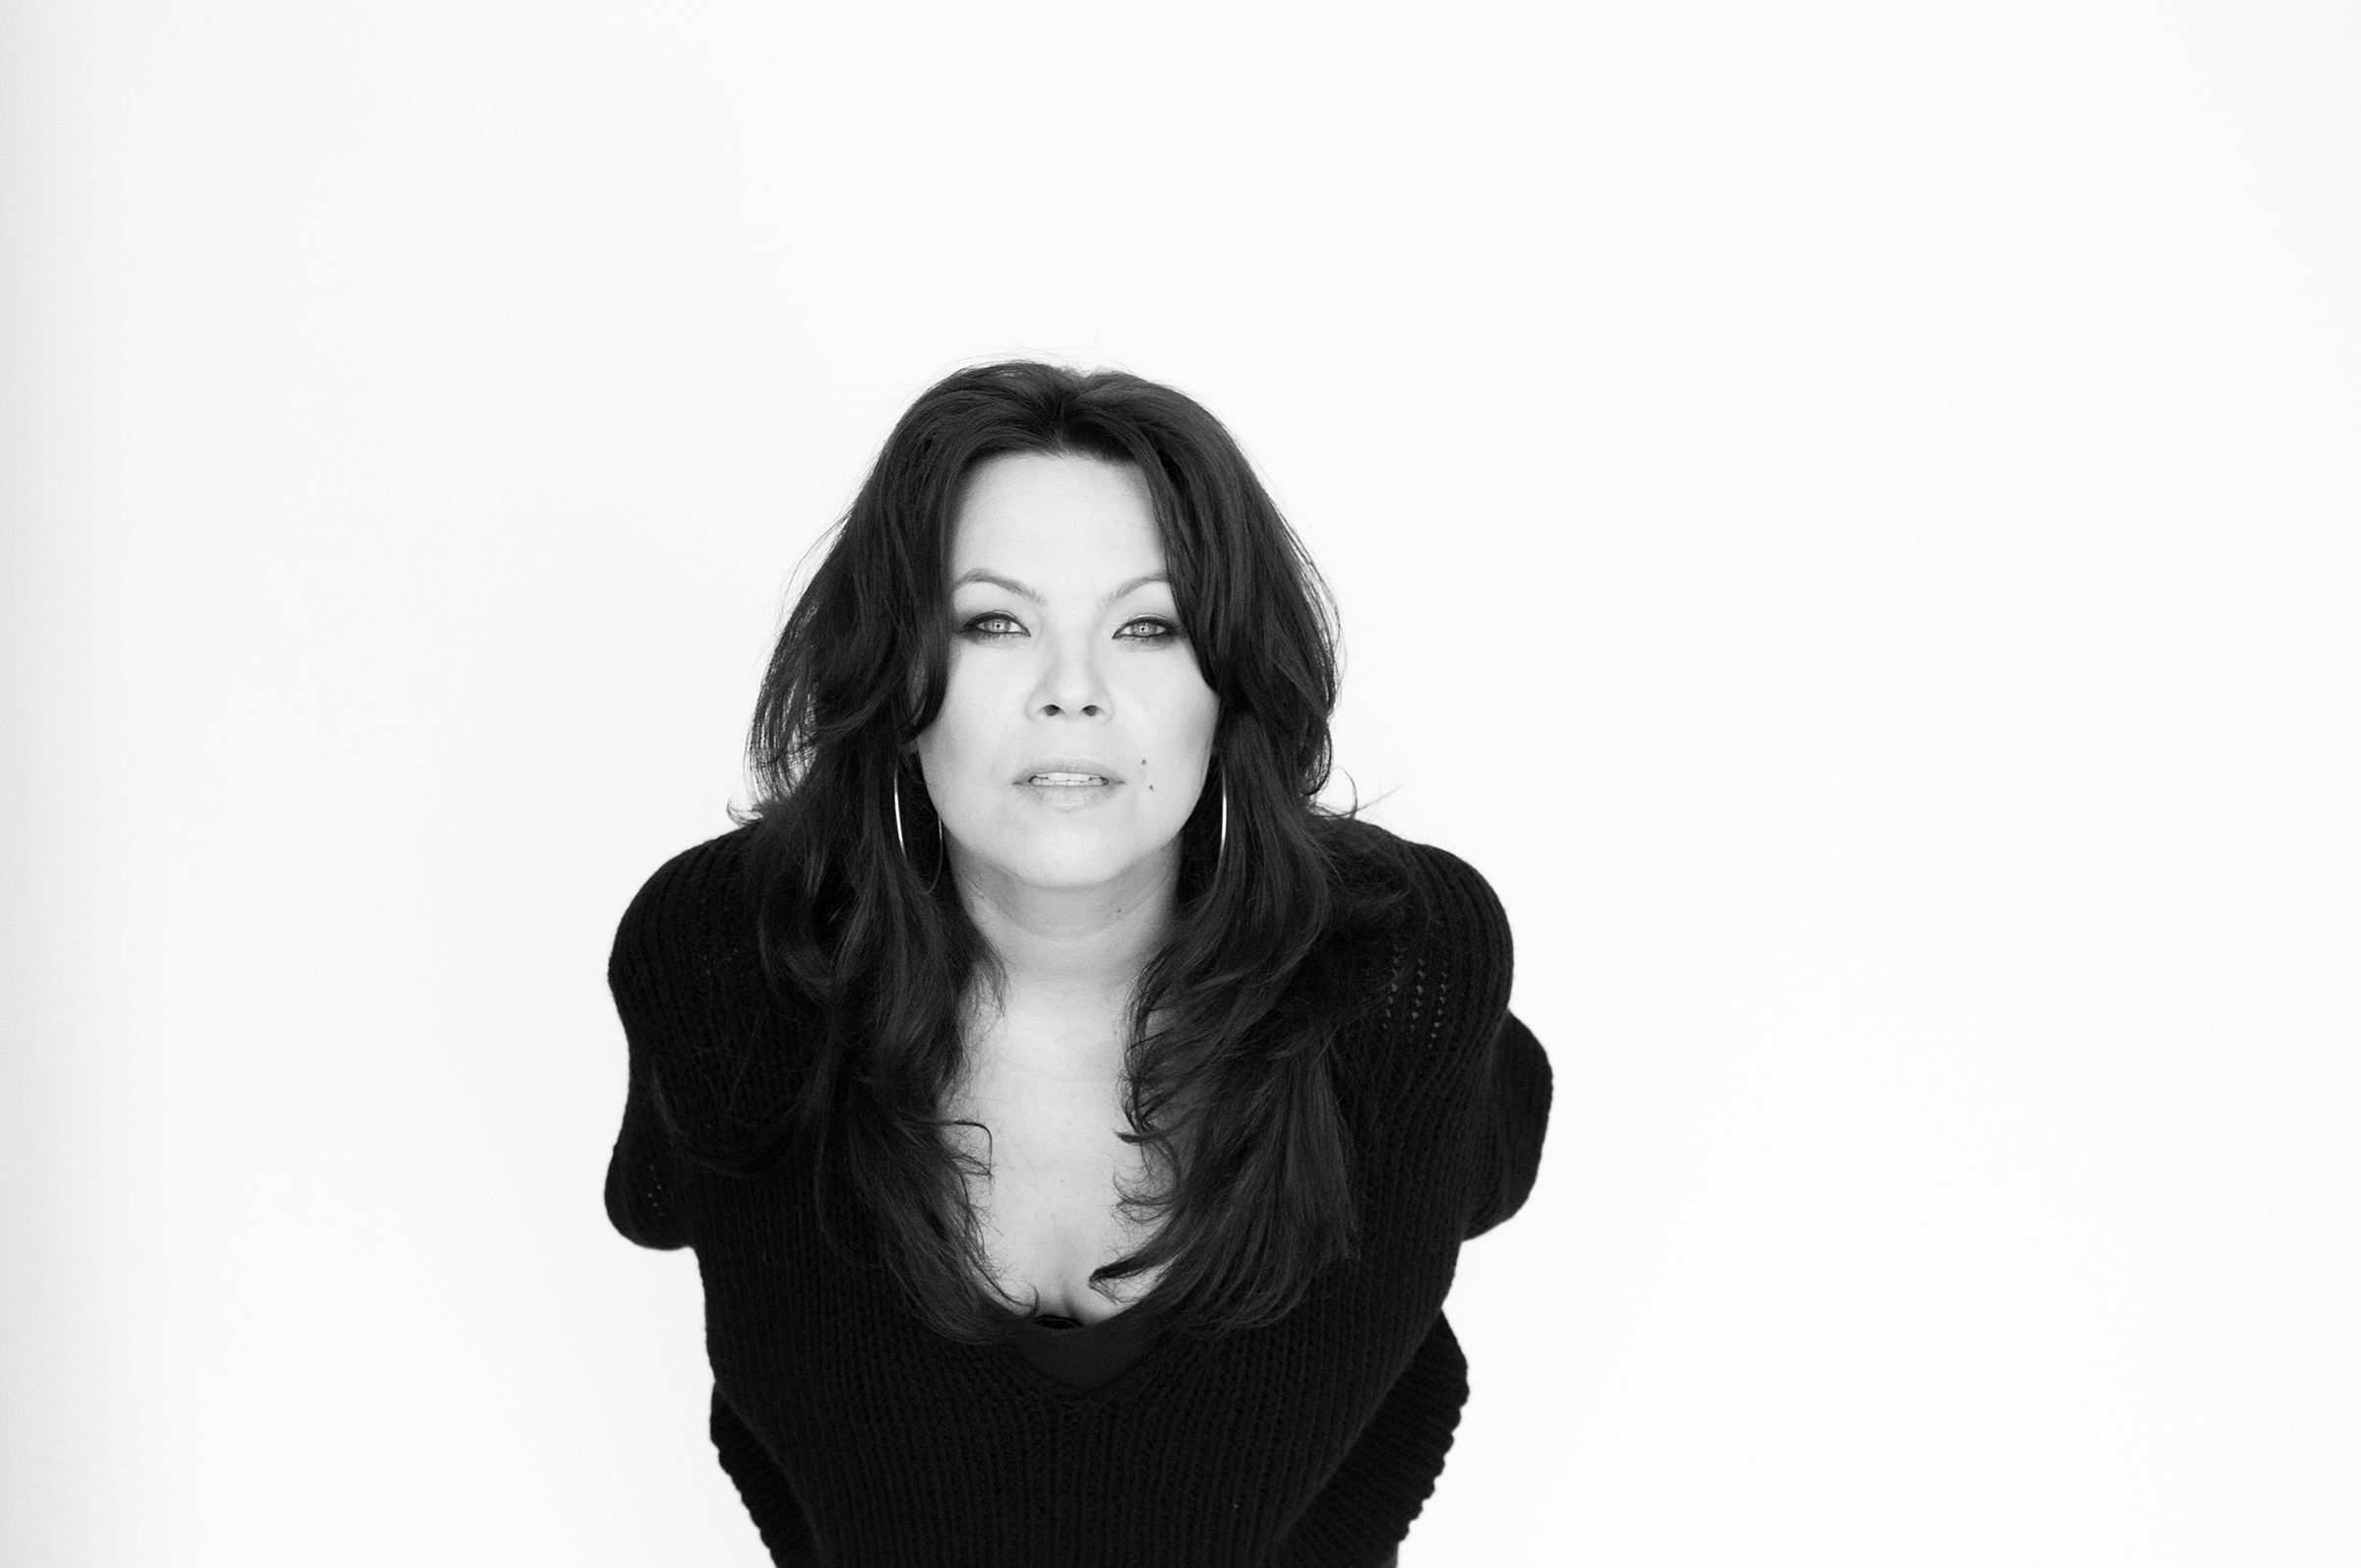 Danielle La Porte – Truthbombs